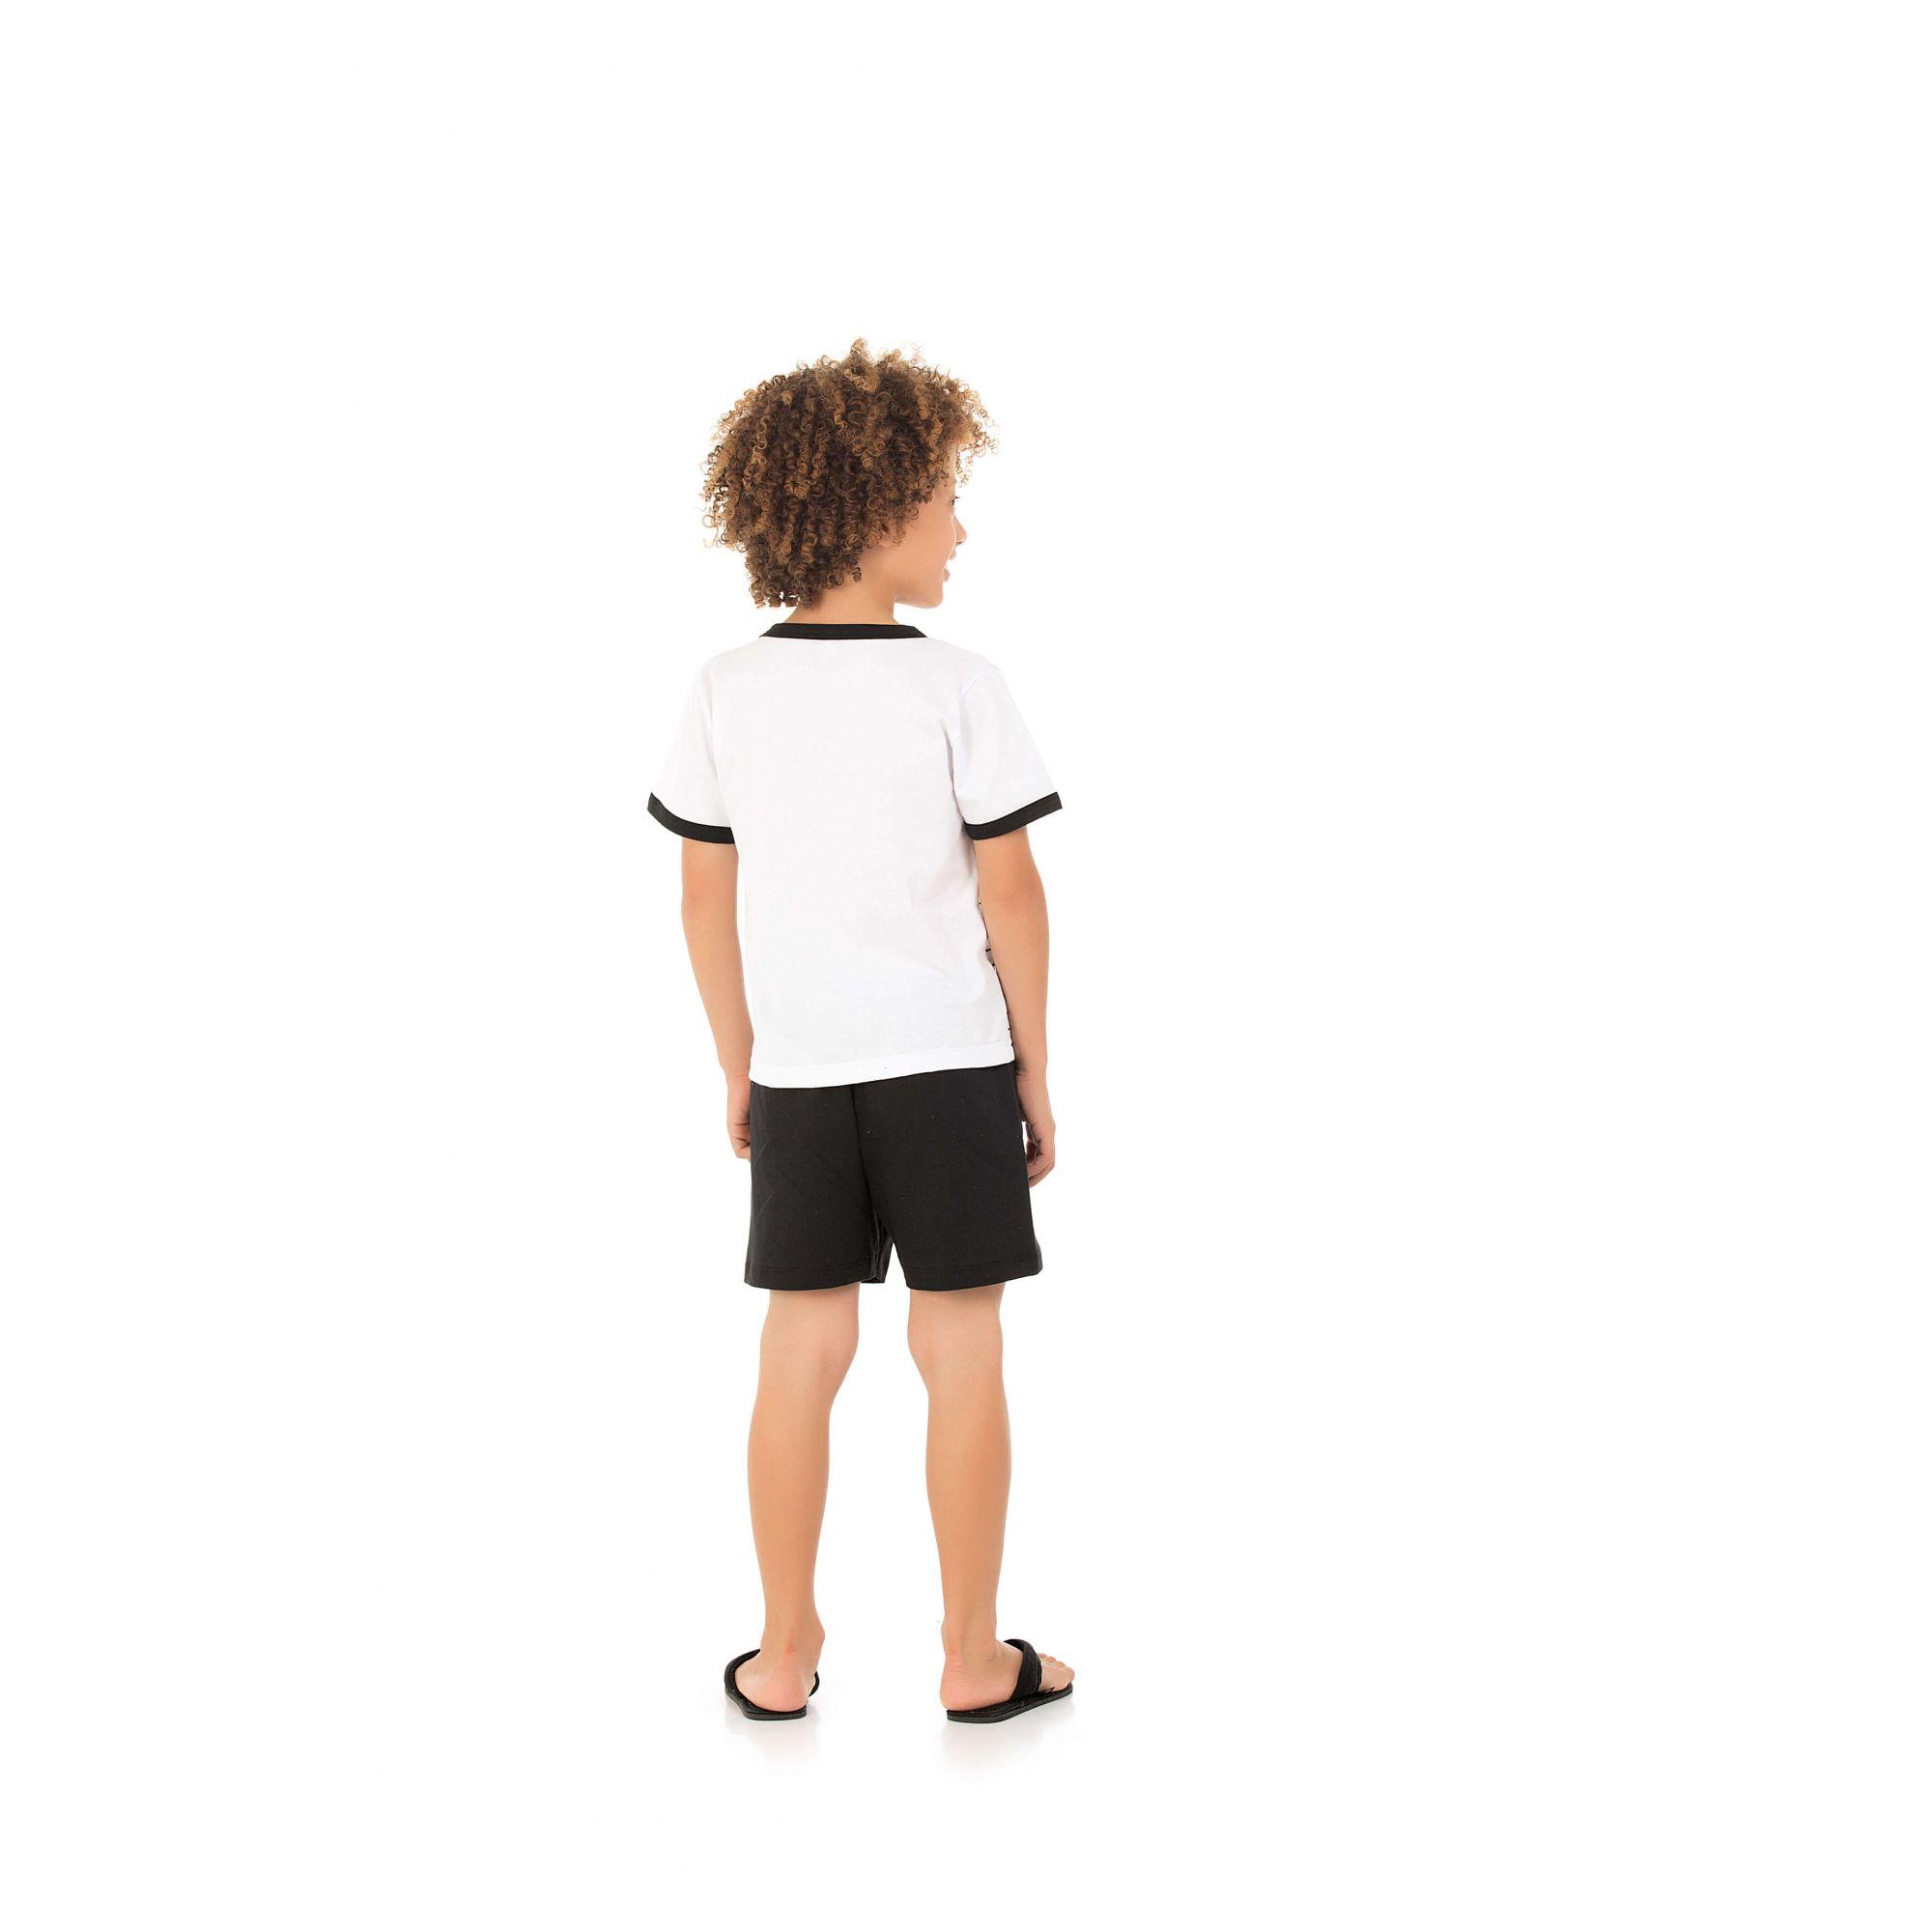 218/D - Pijama Infantil Curto Listrado